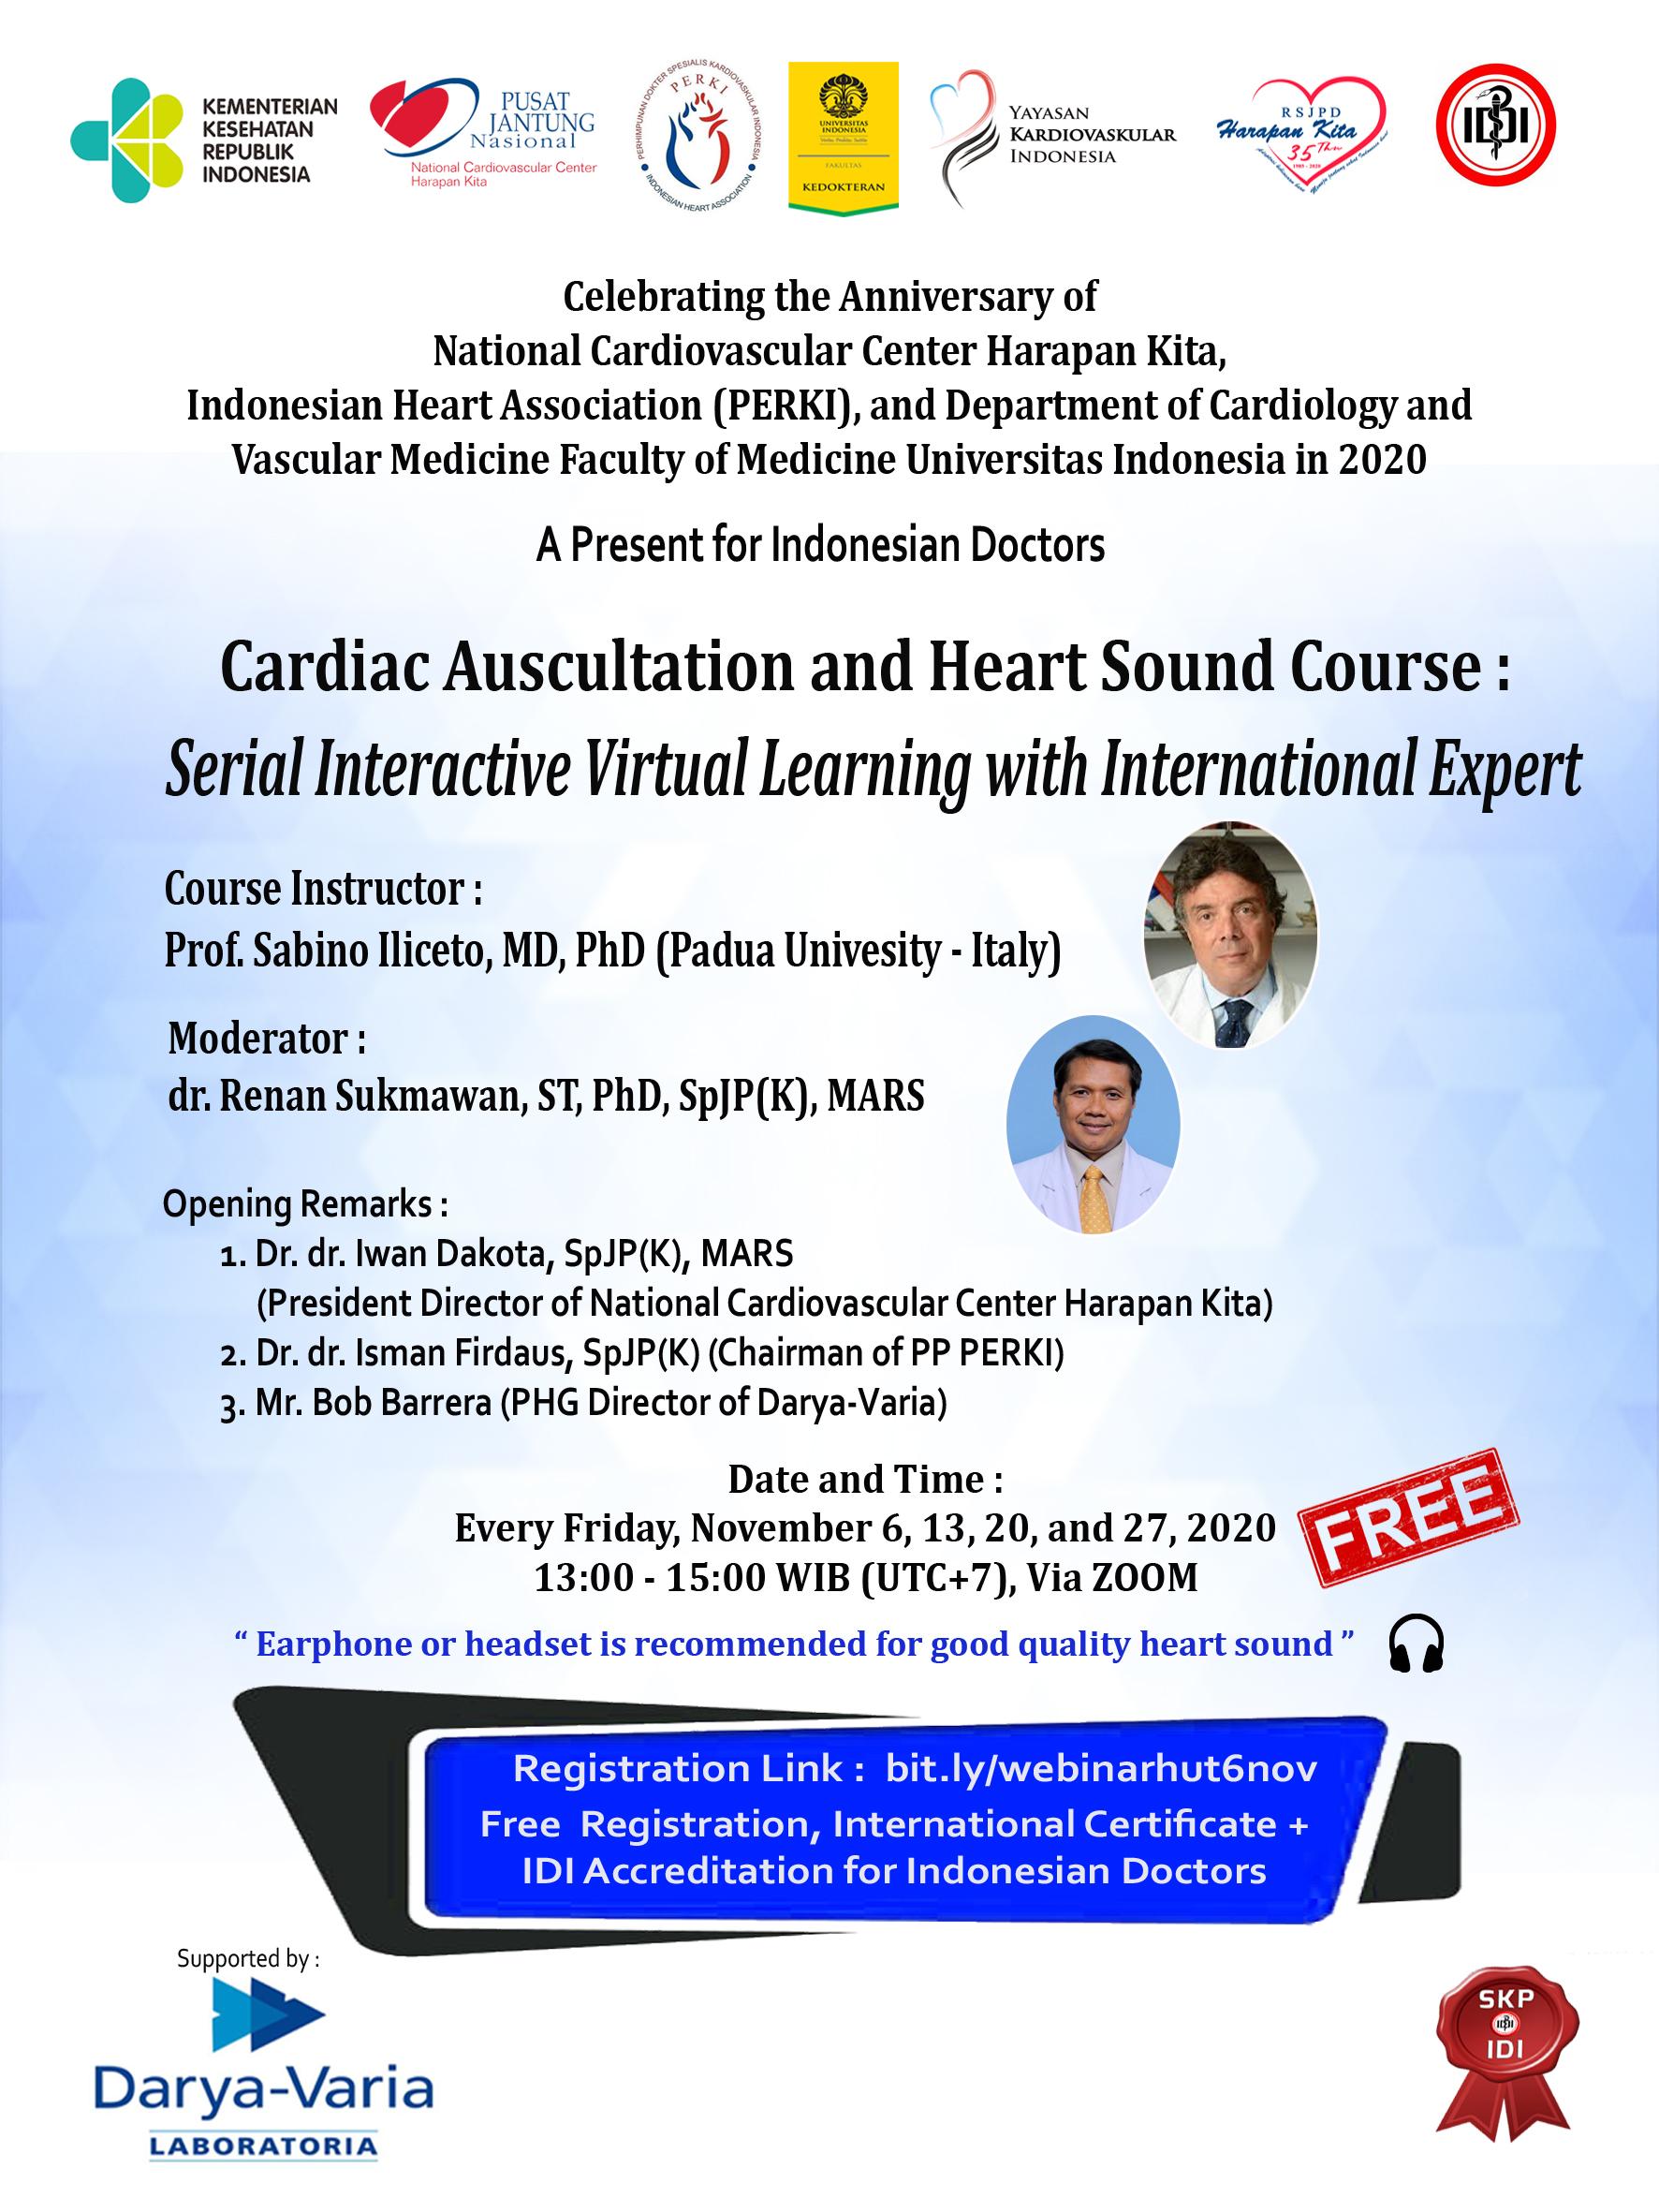 Webinar : Cardiac Auscultation and Heart Sound Course